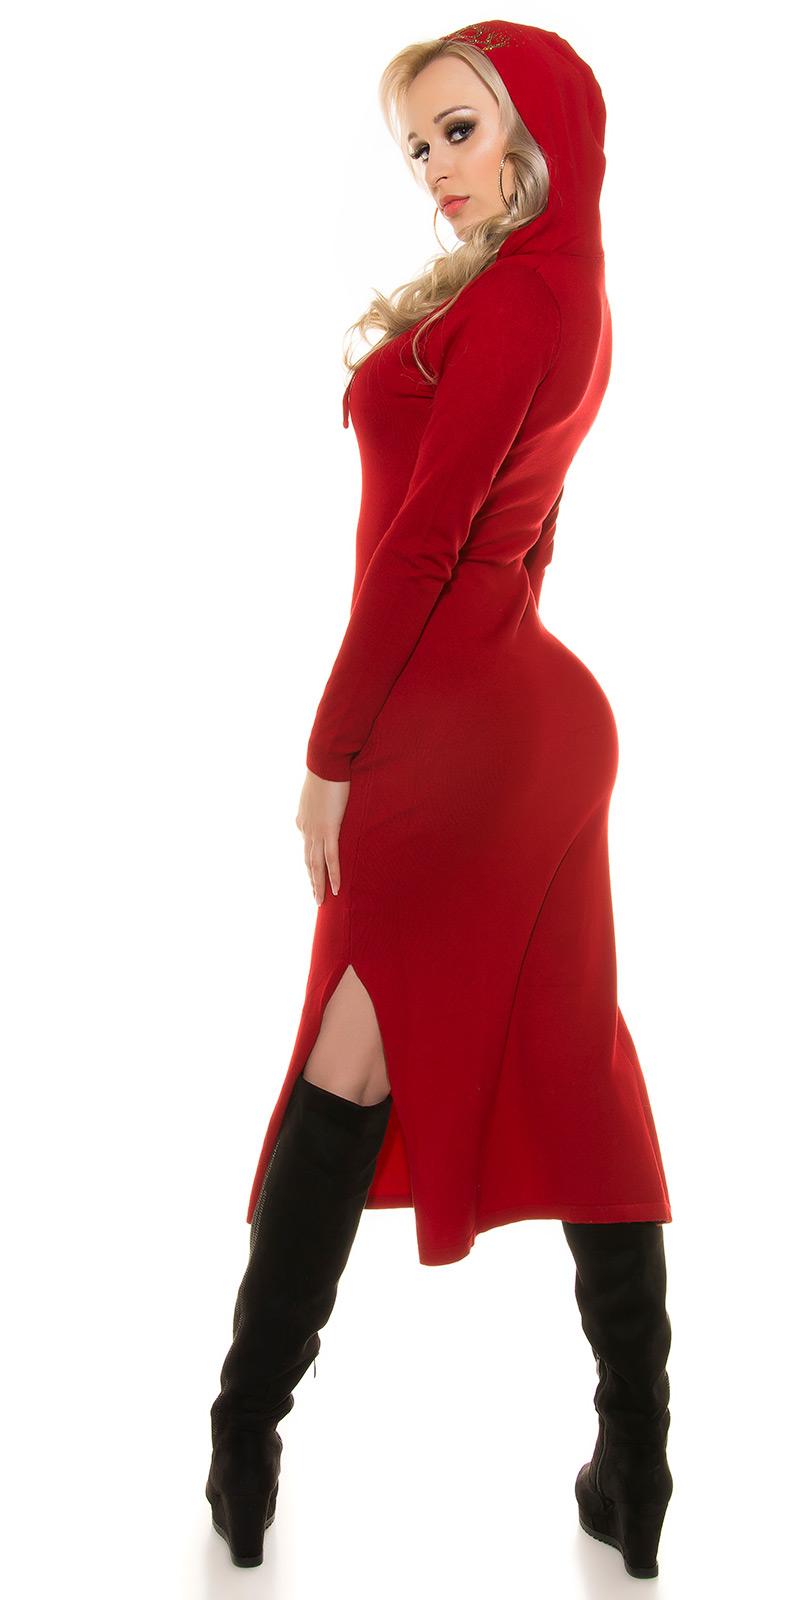 Šaty s dlouhým rukávem 0000ISF8722 - red